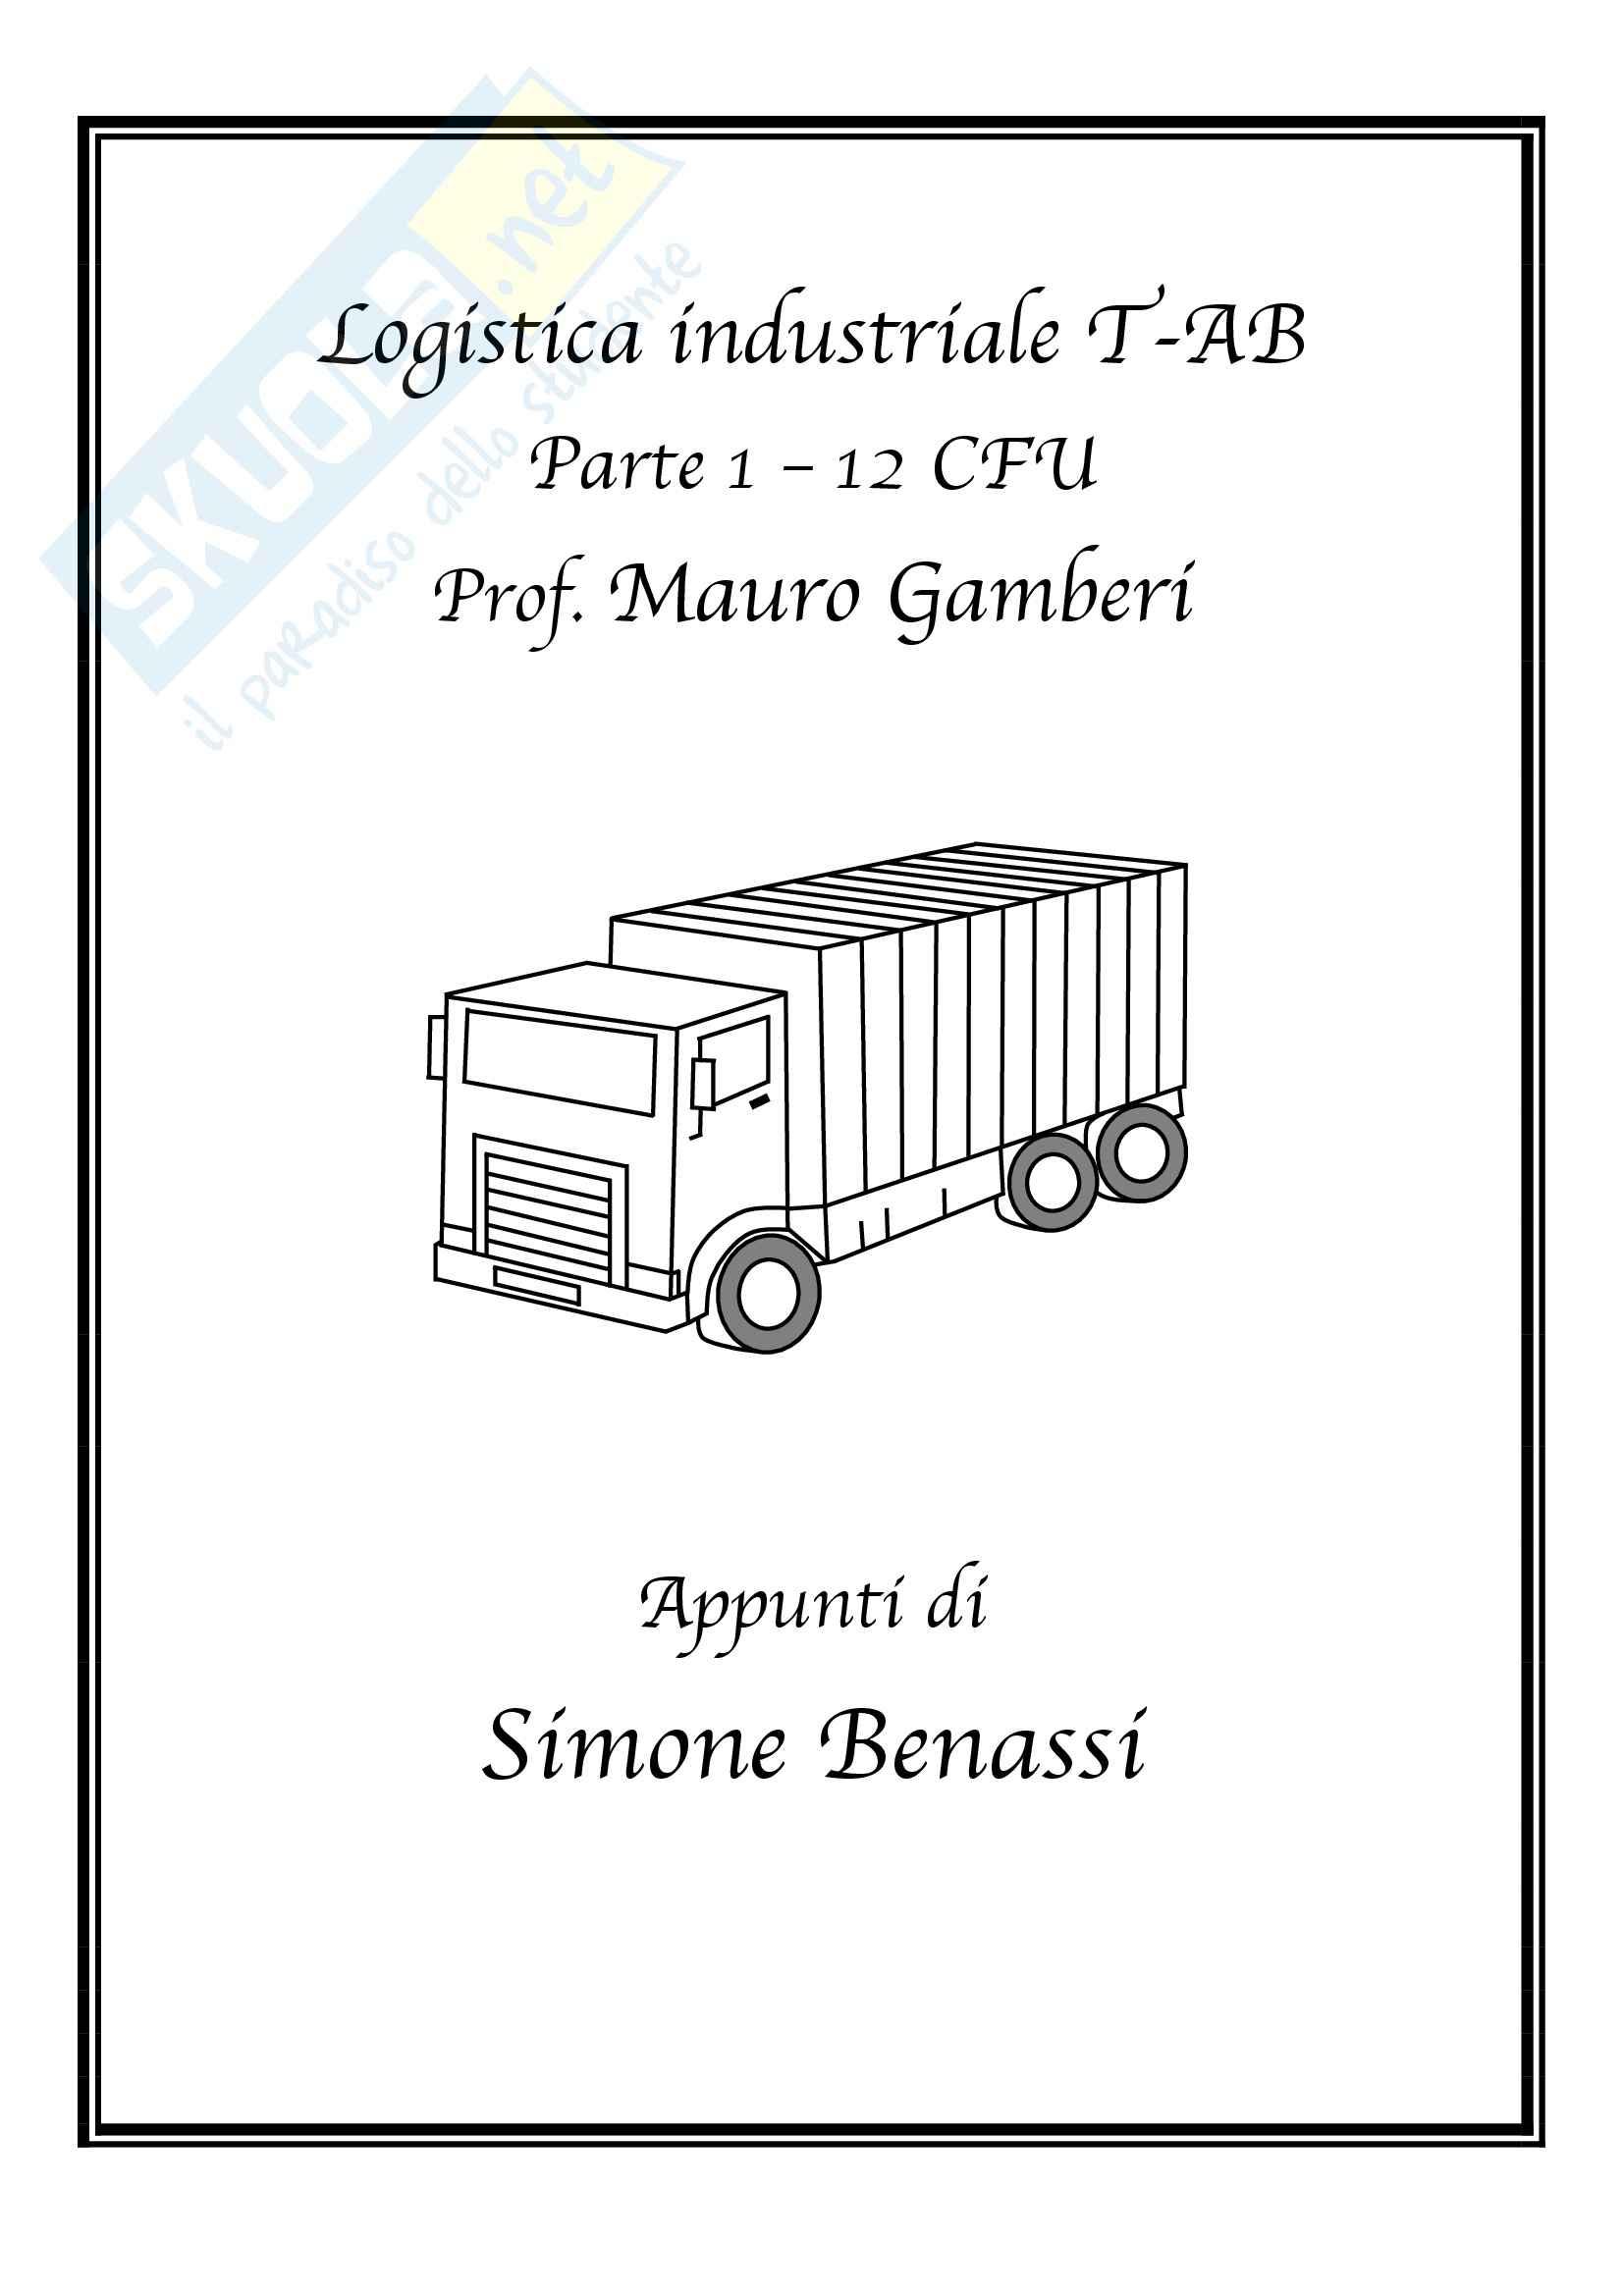 Logistica industriale T-AB - Appunti prima parte